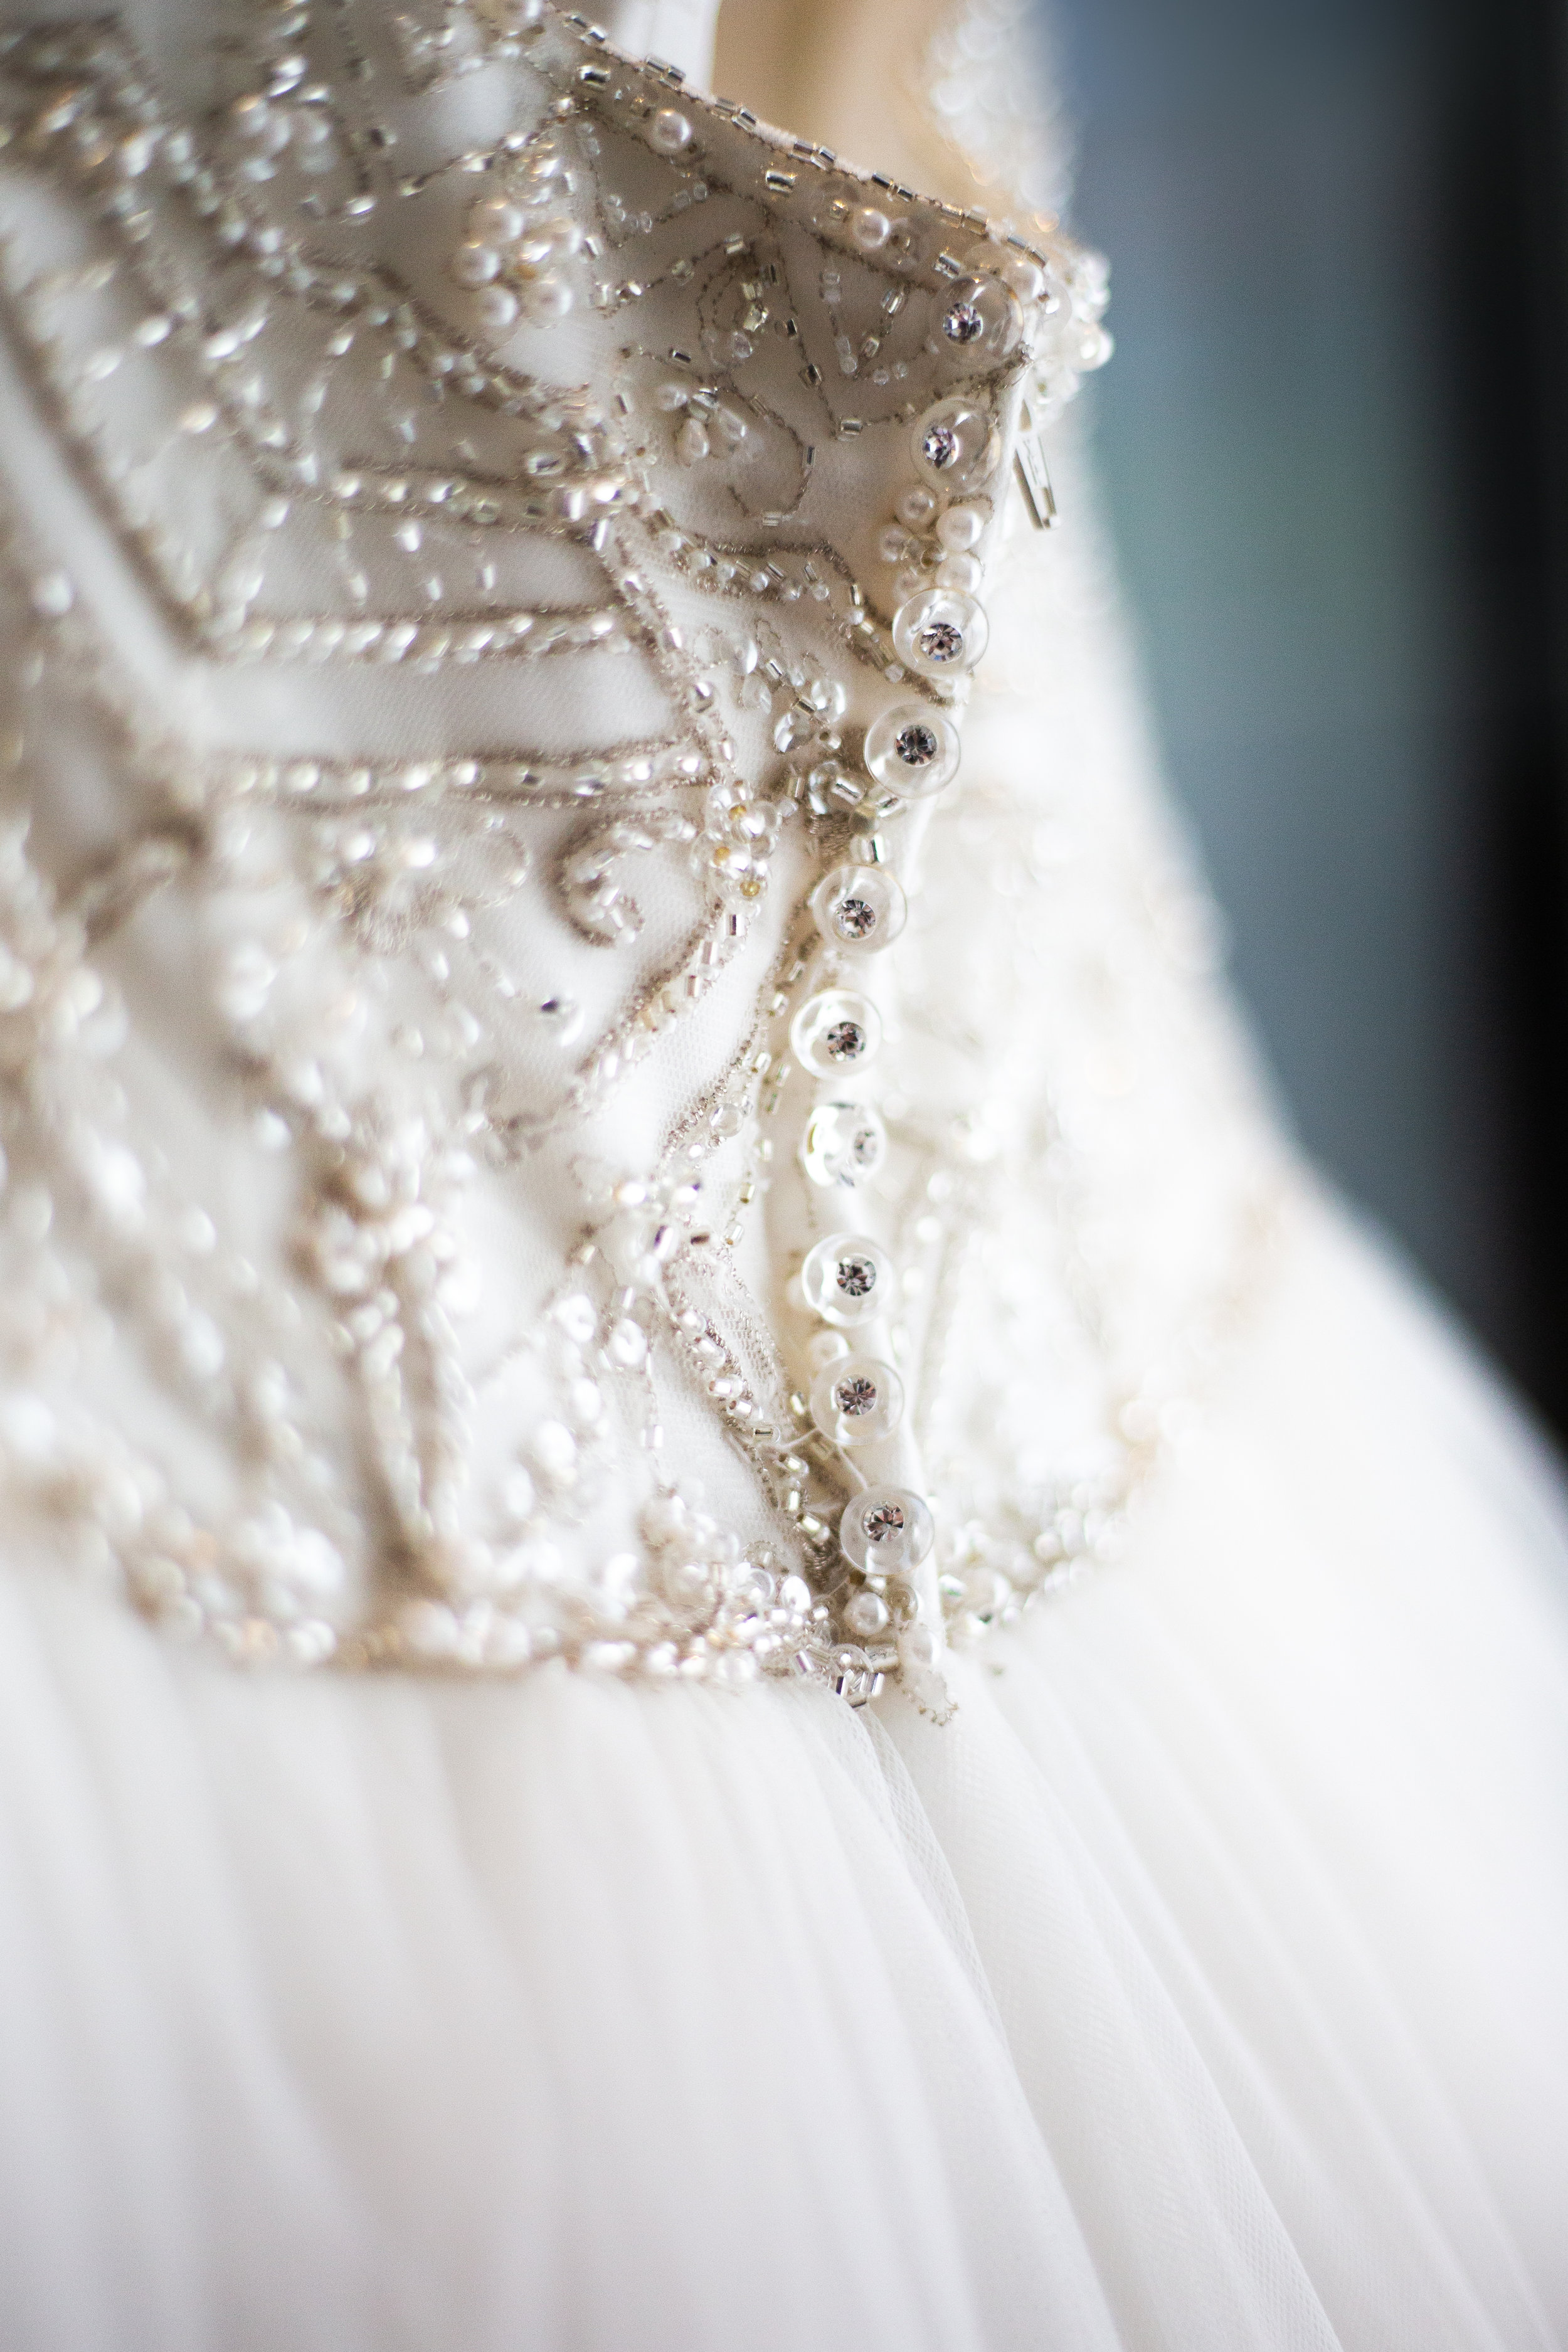 wedding-lea-cooper-photography-willenhall-west-midlands-wolverhampton-dudley-birmingham-uk-marriage-hadley-park-east-telford-dress-detail.jpg